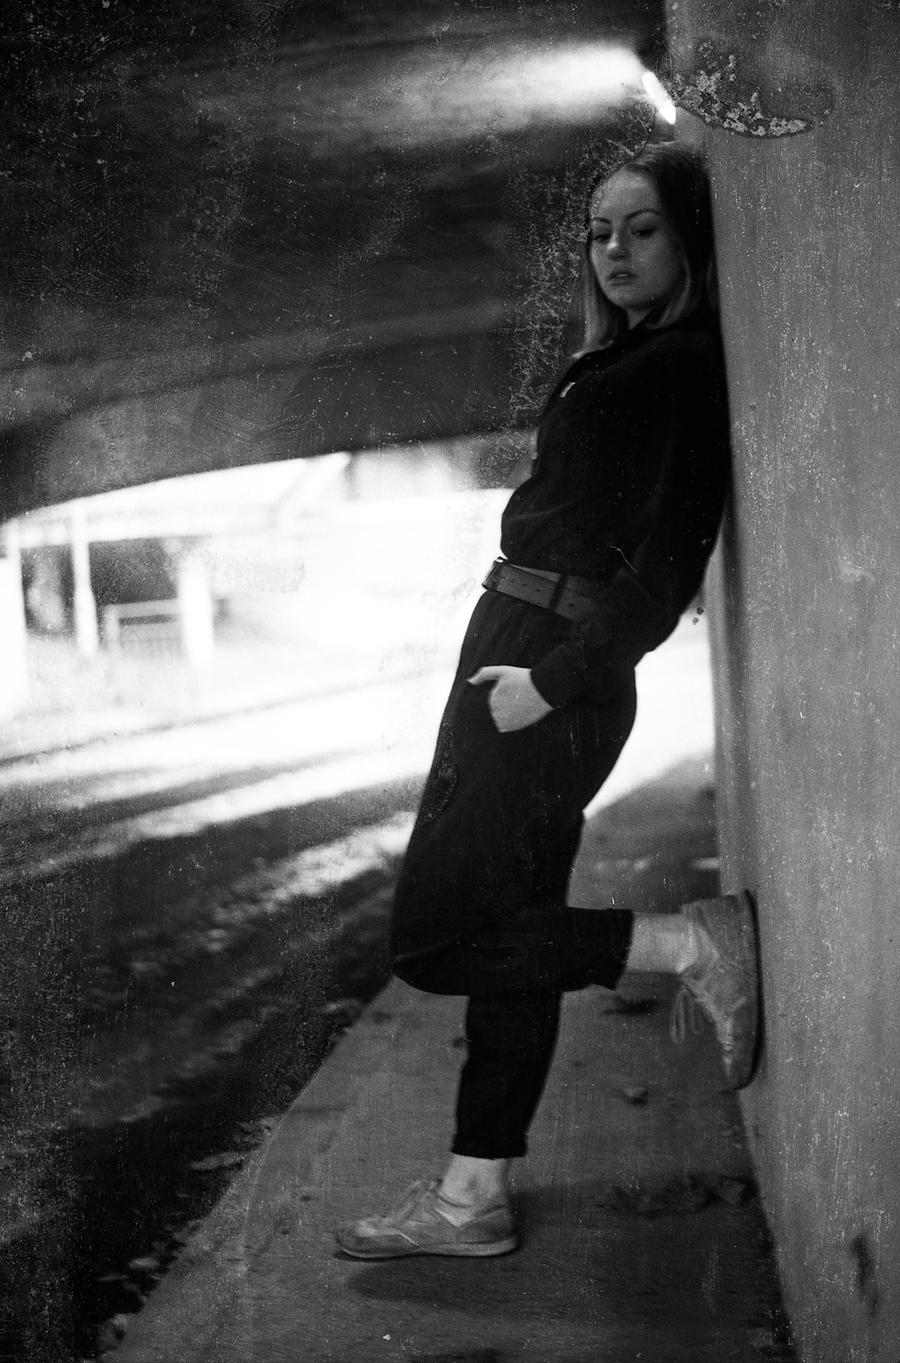 Hanging about / Model Elvira Wolfe / Uploaded 21st September 2019 @ 08:21 PM